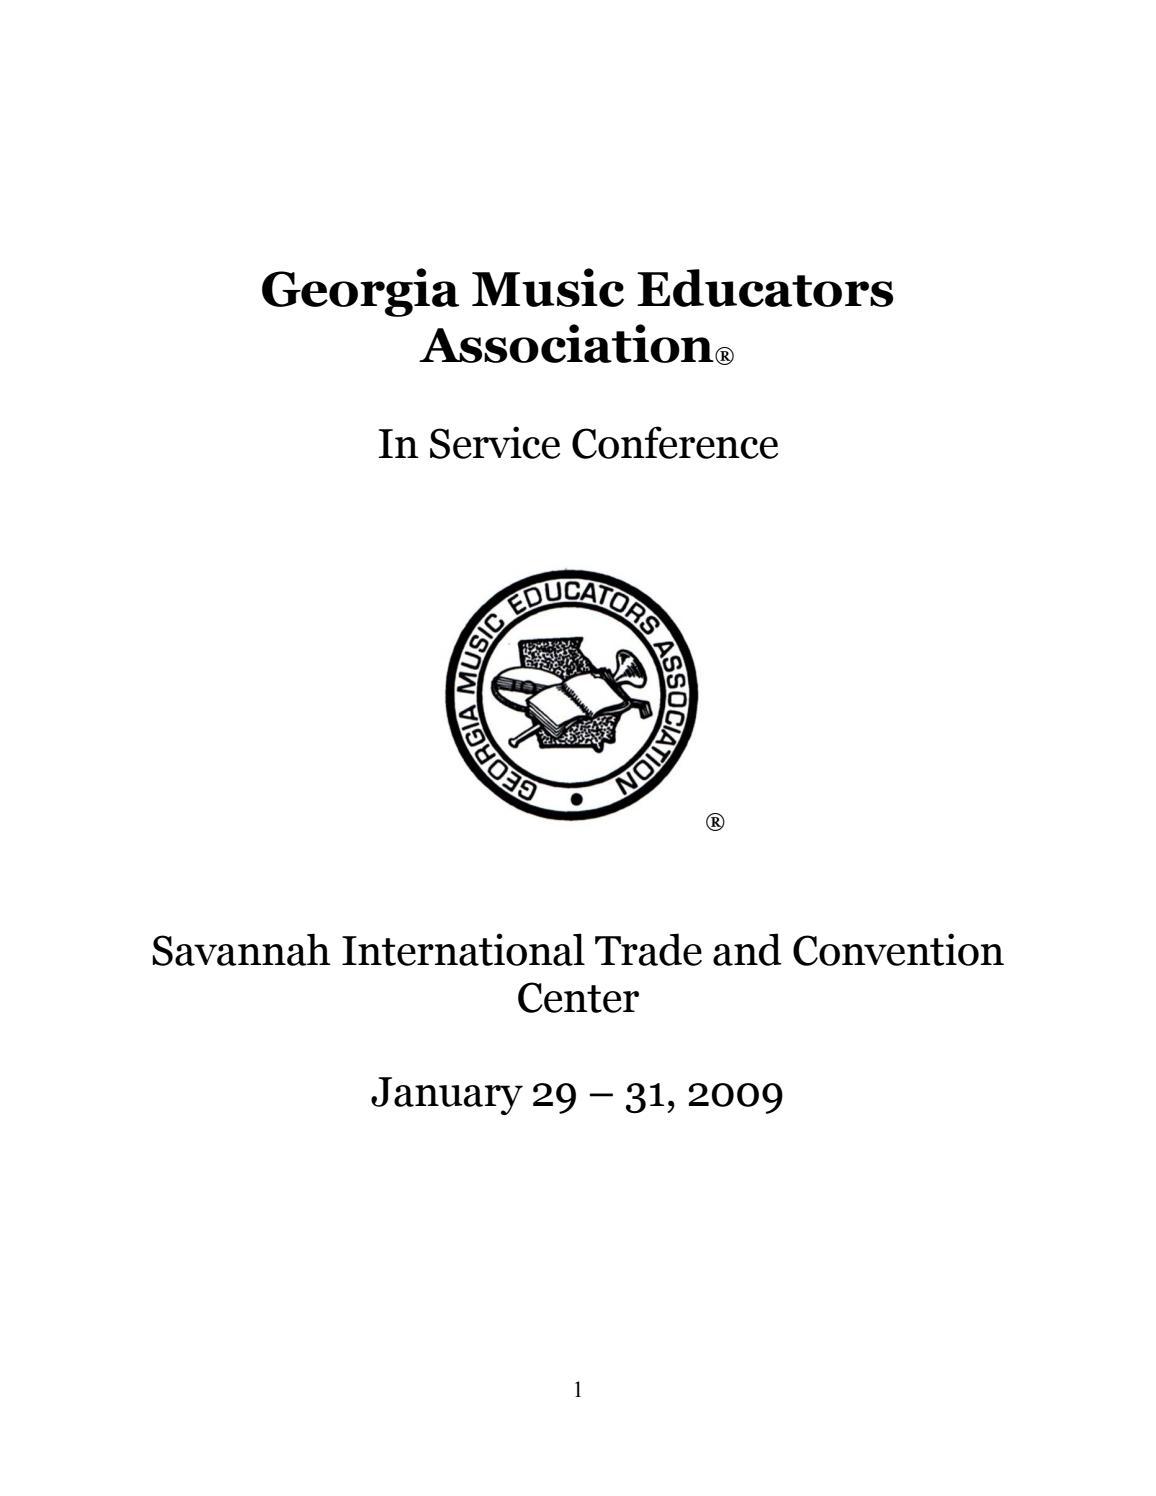 2009 GMEA In-Service Conference Program by Georgia Music